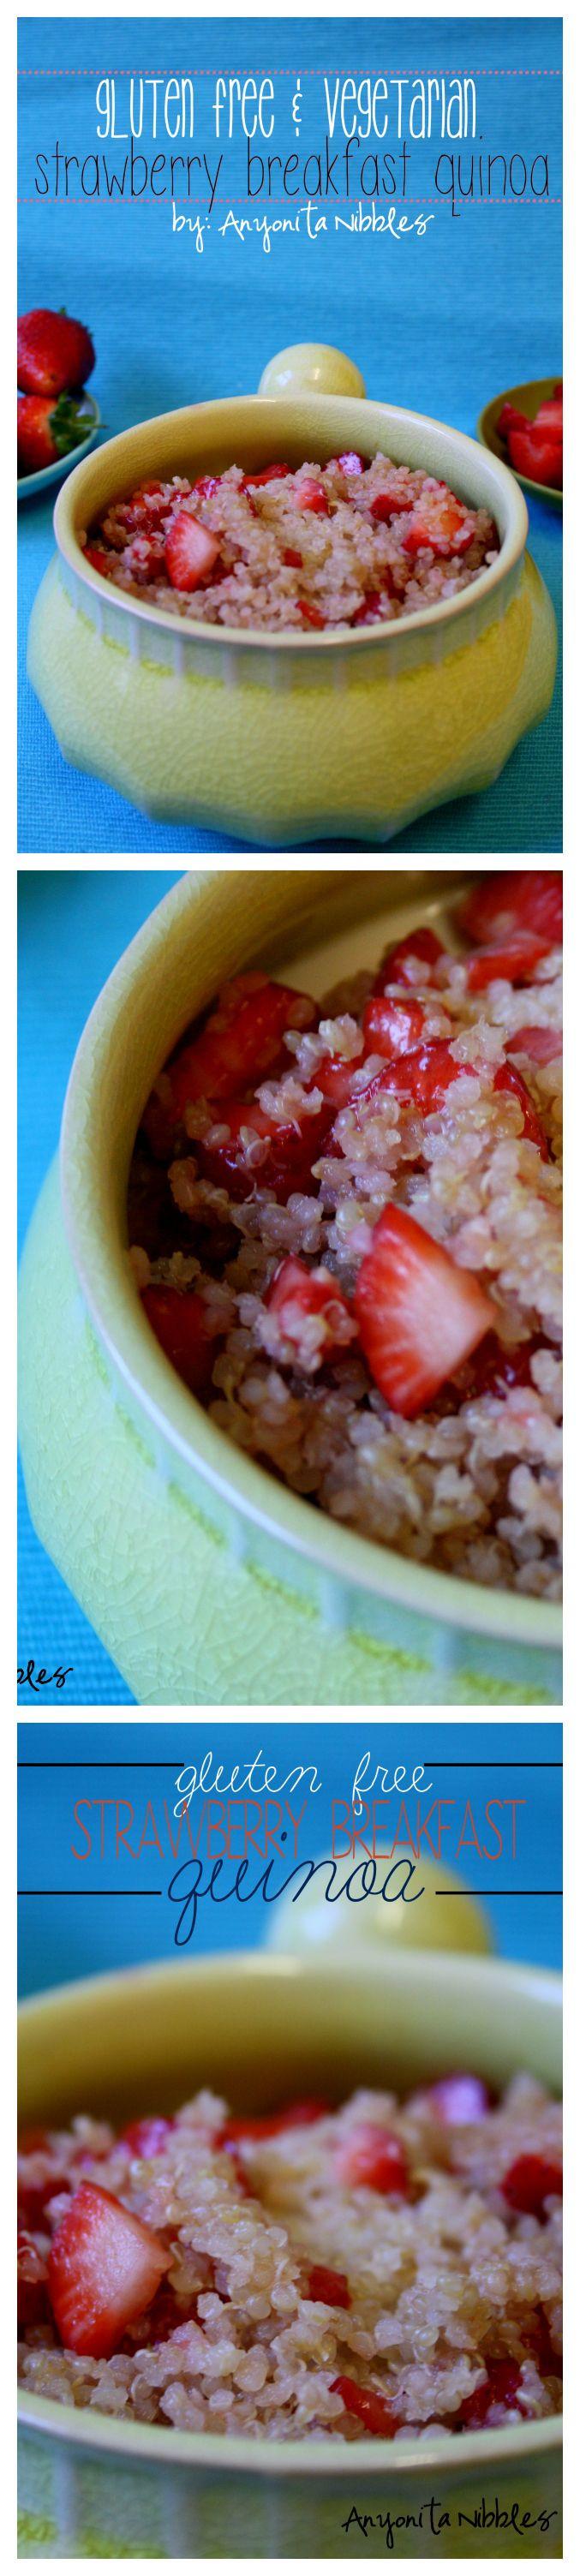 Vegetarian Dairy Free Recipes  Gluten Free Ve arian Breakfast Recipe Strawberry